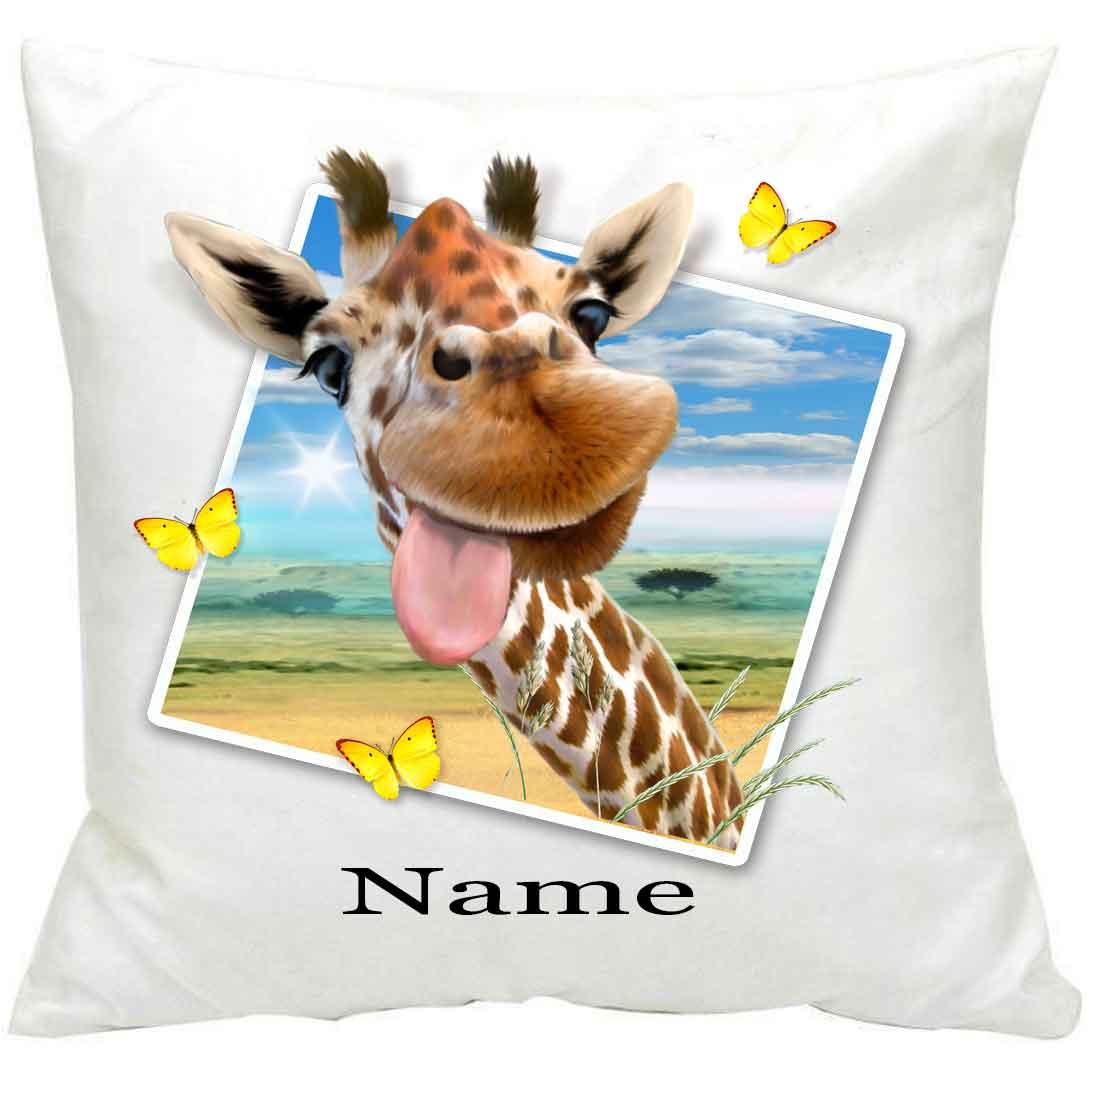 PersonalisedGiraffe Selfie Printed Cushion